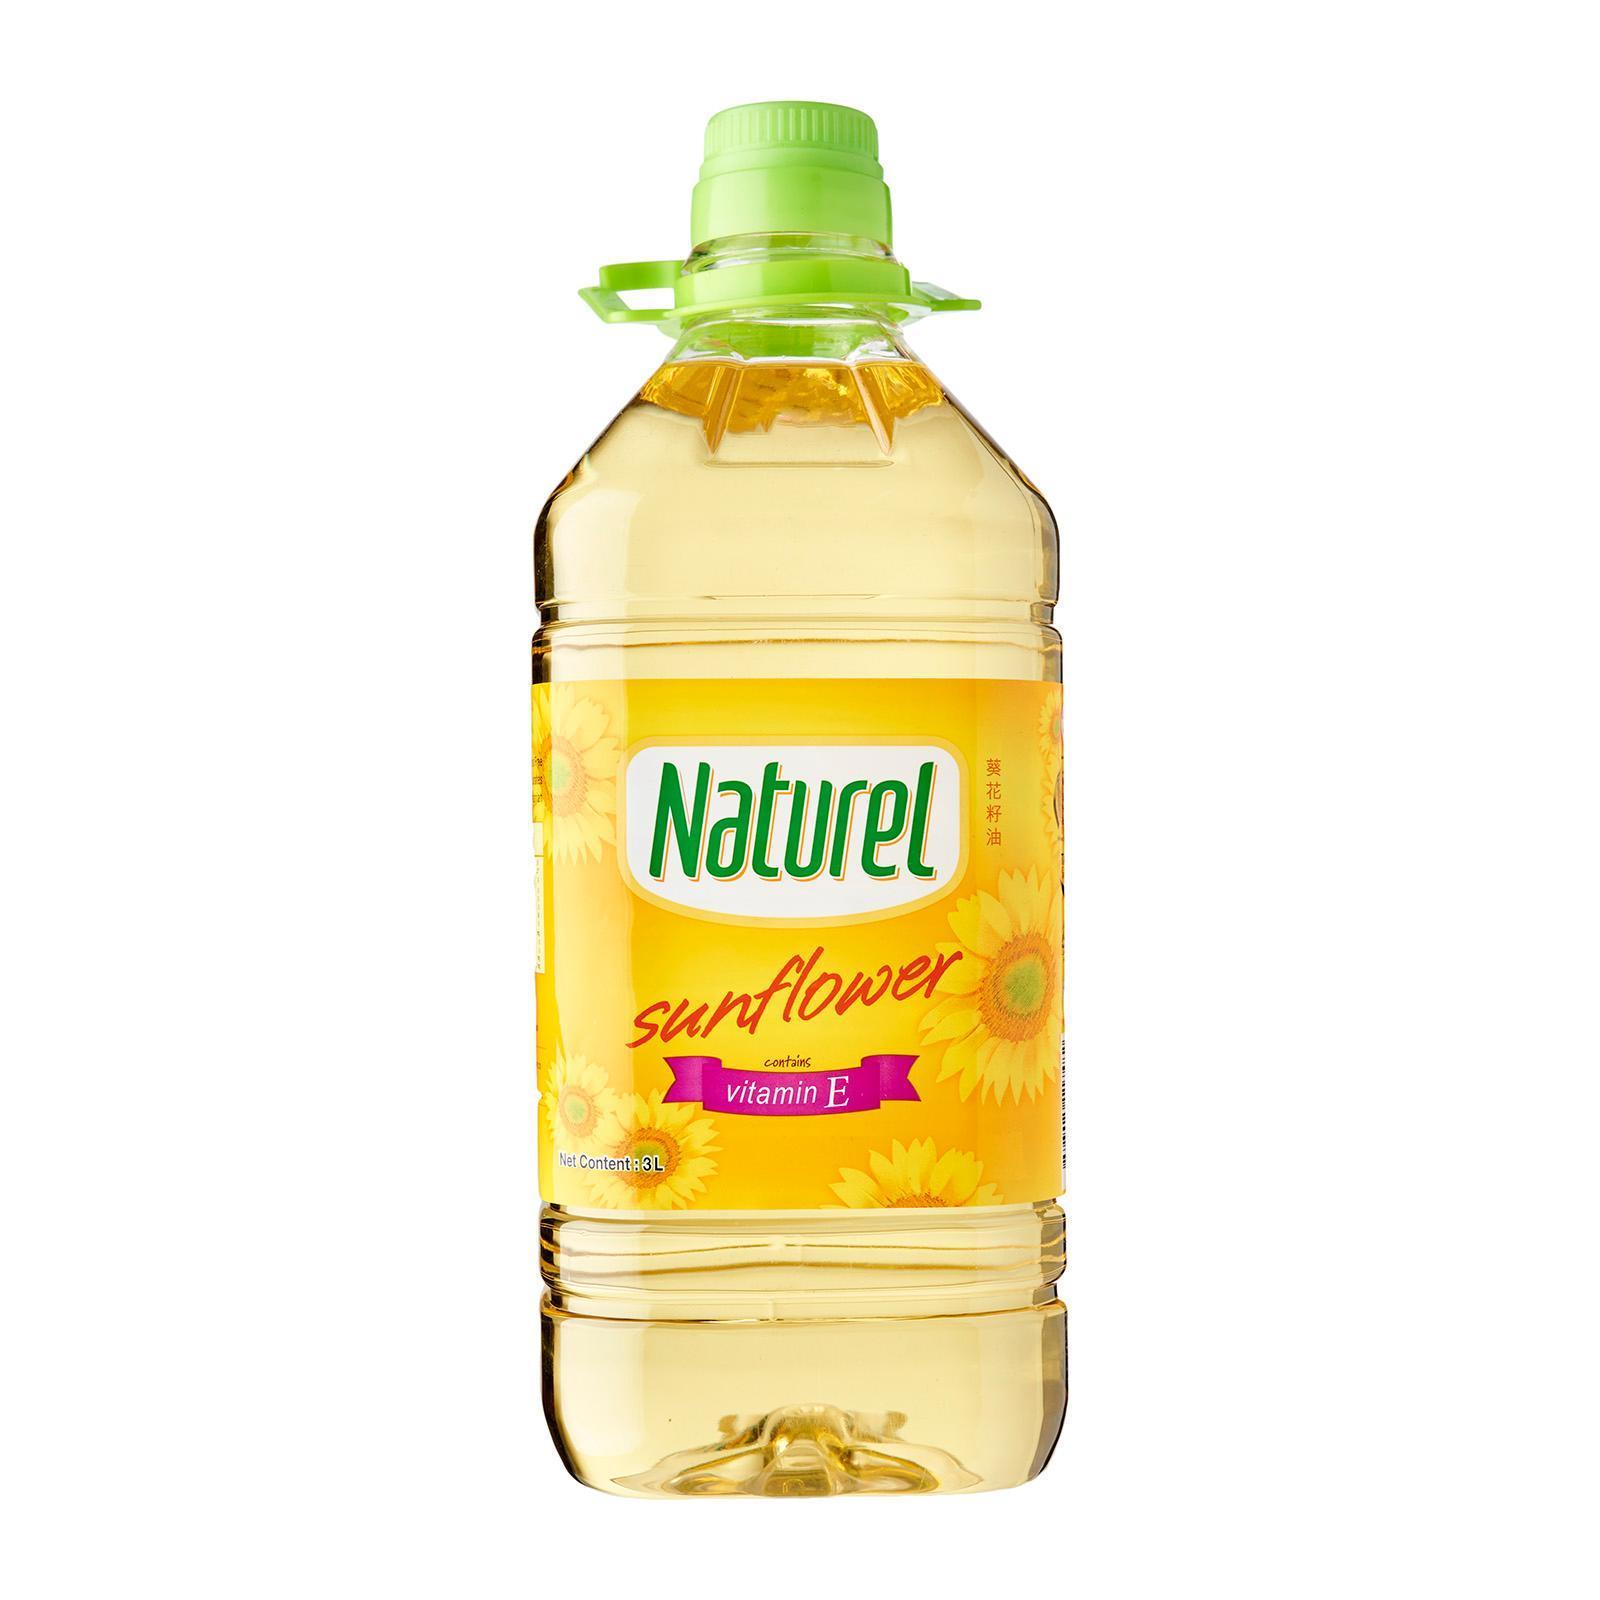 Naturel Sunflower Oil By Redmart.